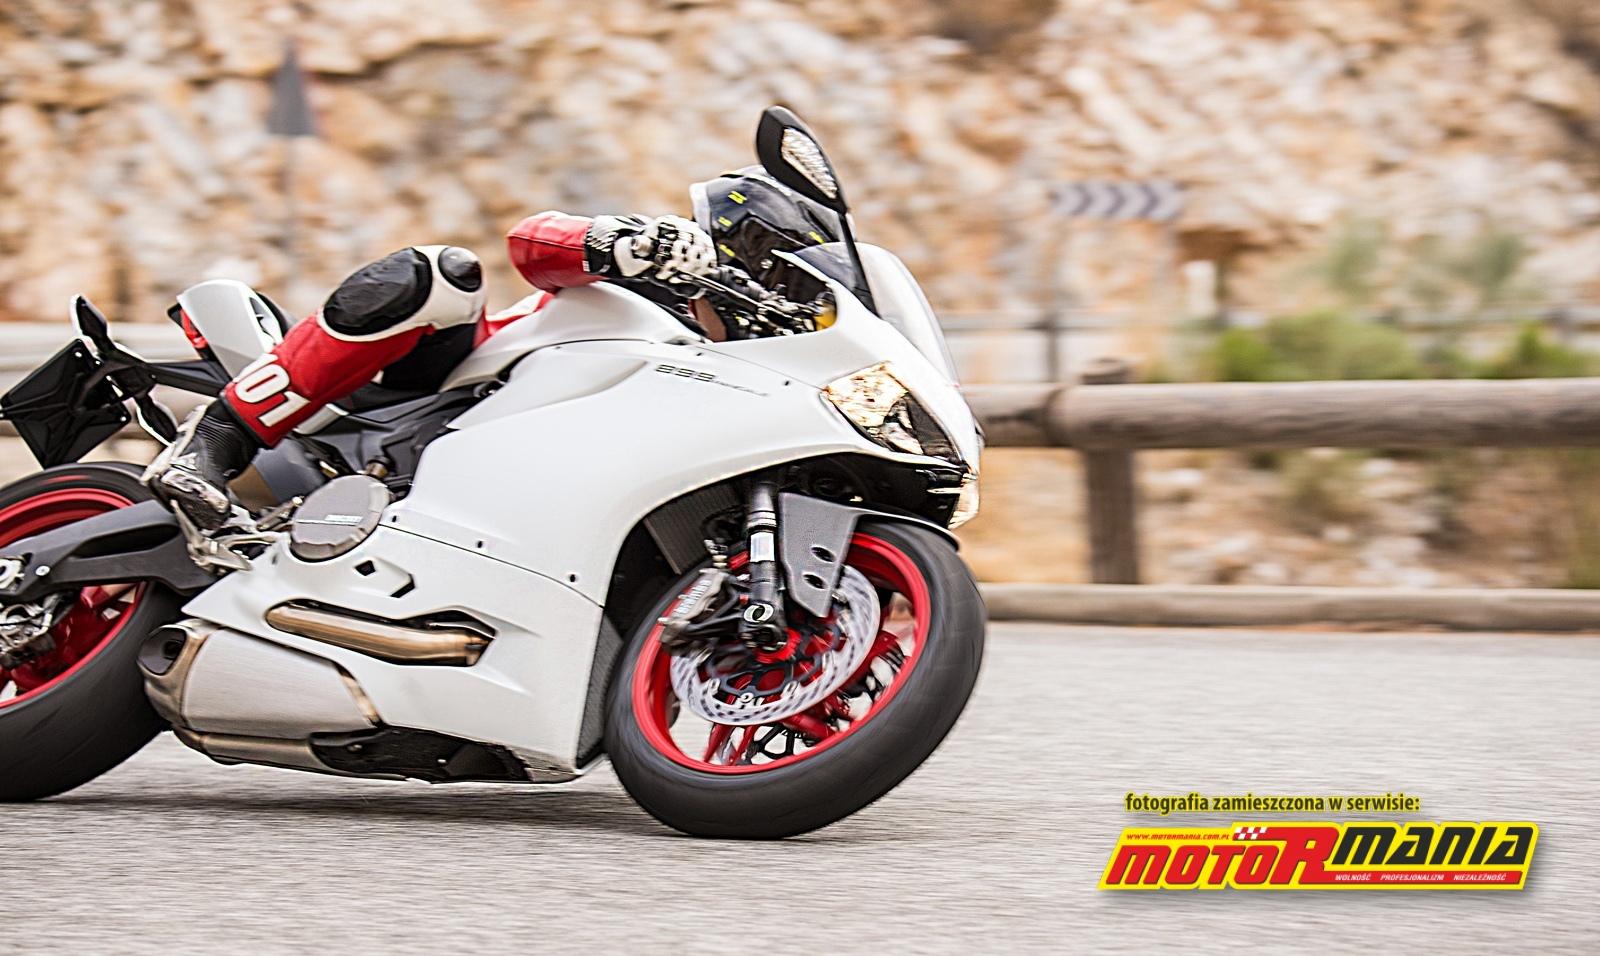 MotoRmania Ducati 899 Panigale